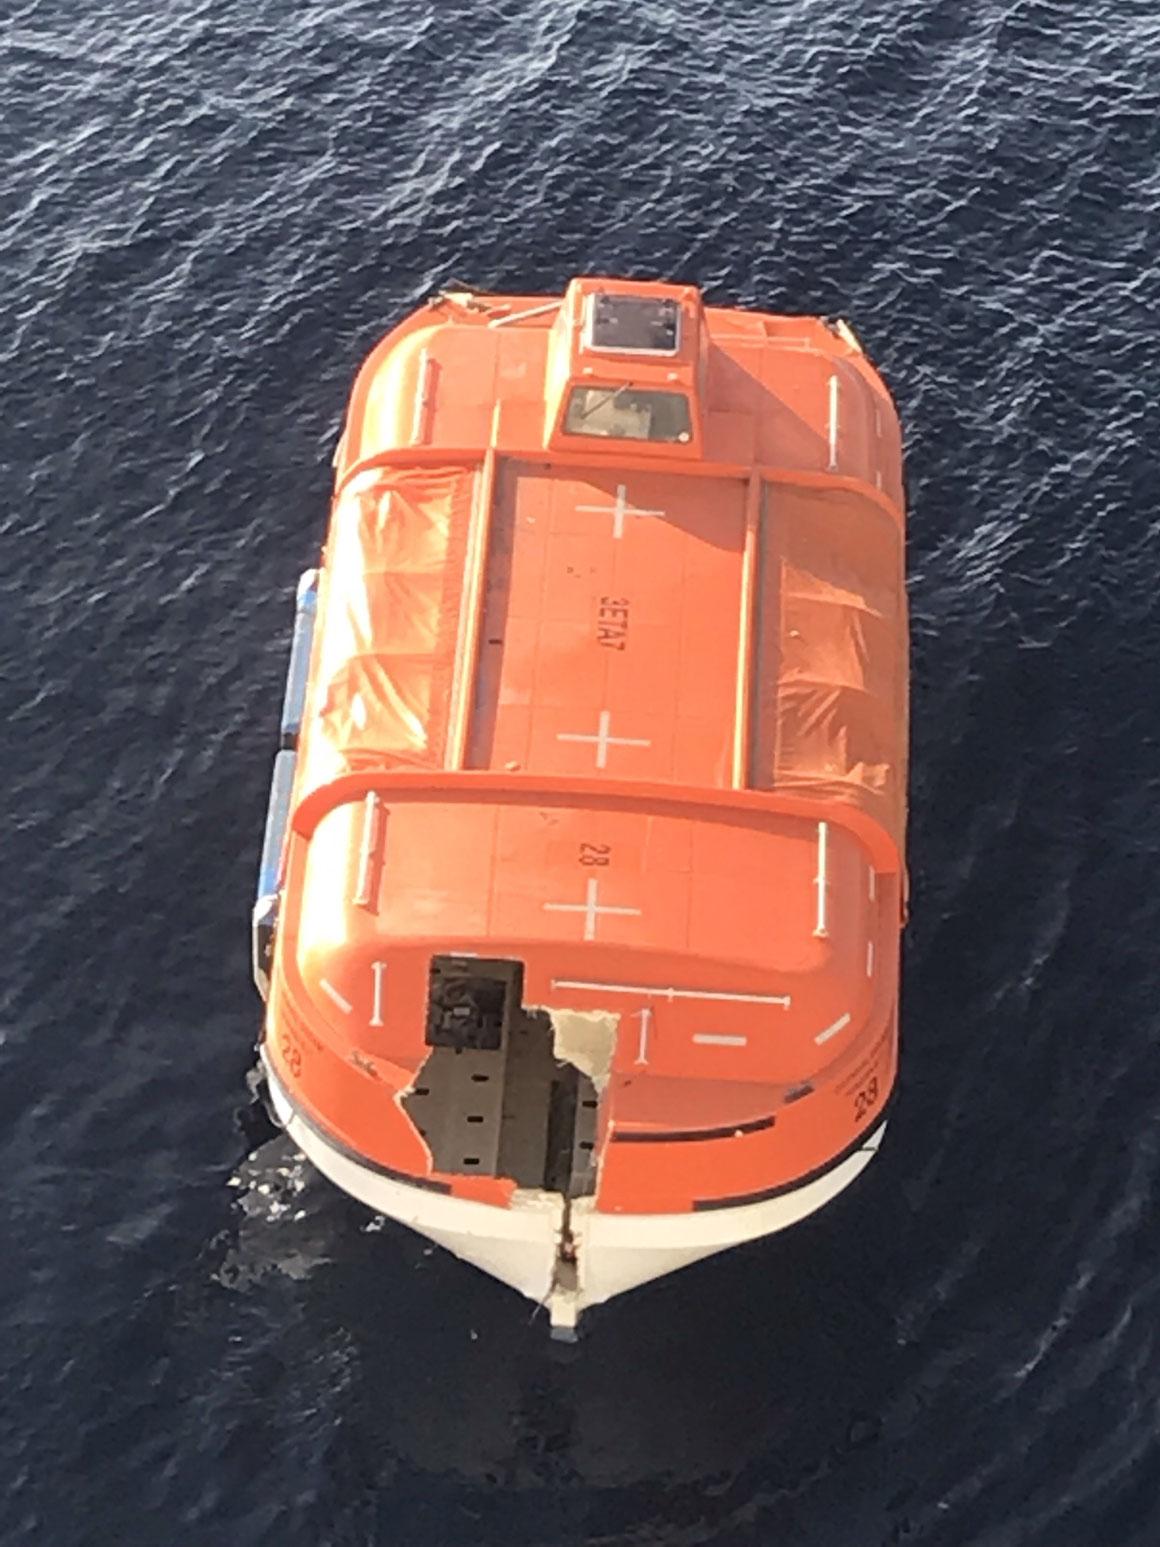 Carnival Dream verliert Rettungsboot